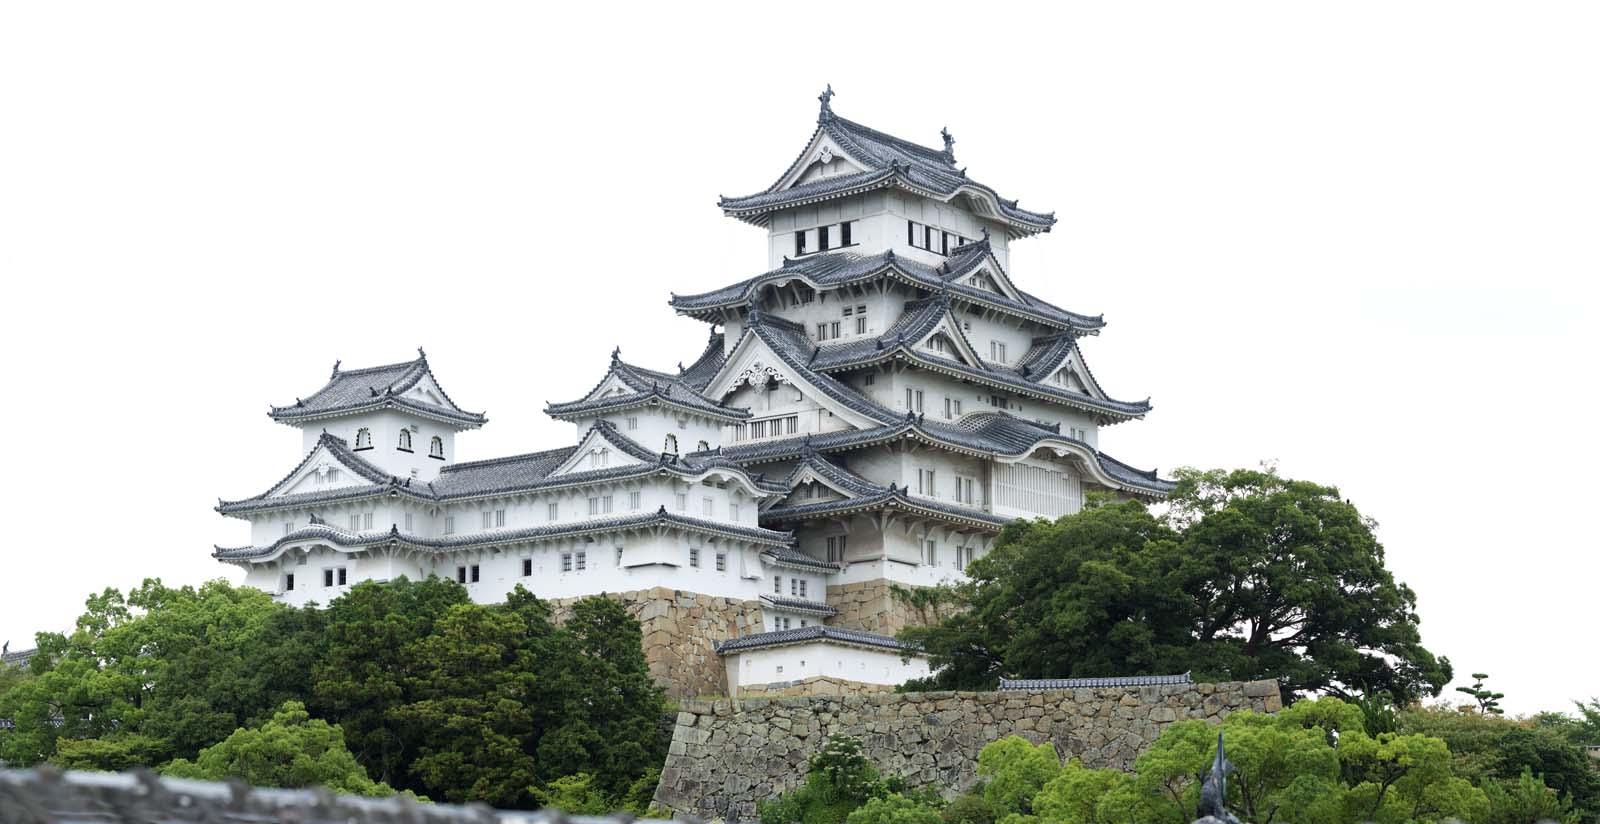 photo,material,free,landscape,picture,stock photo,Creative Commons,Himeji-jo Castle, Four national treasures Castle, Sadanori Akamatsu, Shigetaka Kuroda, Hideyoshi Hashiba